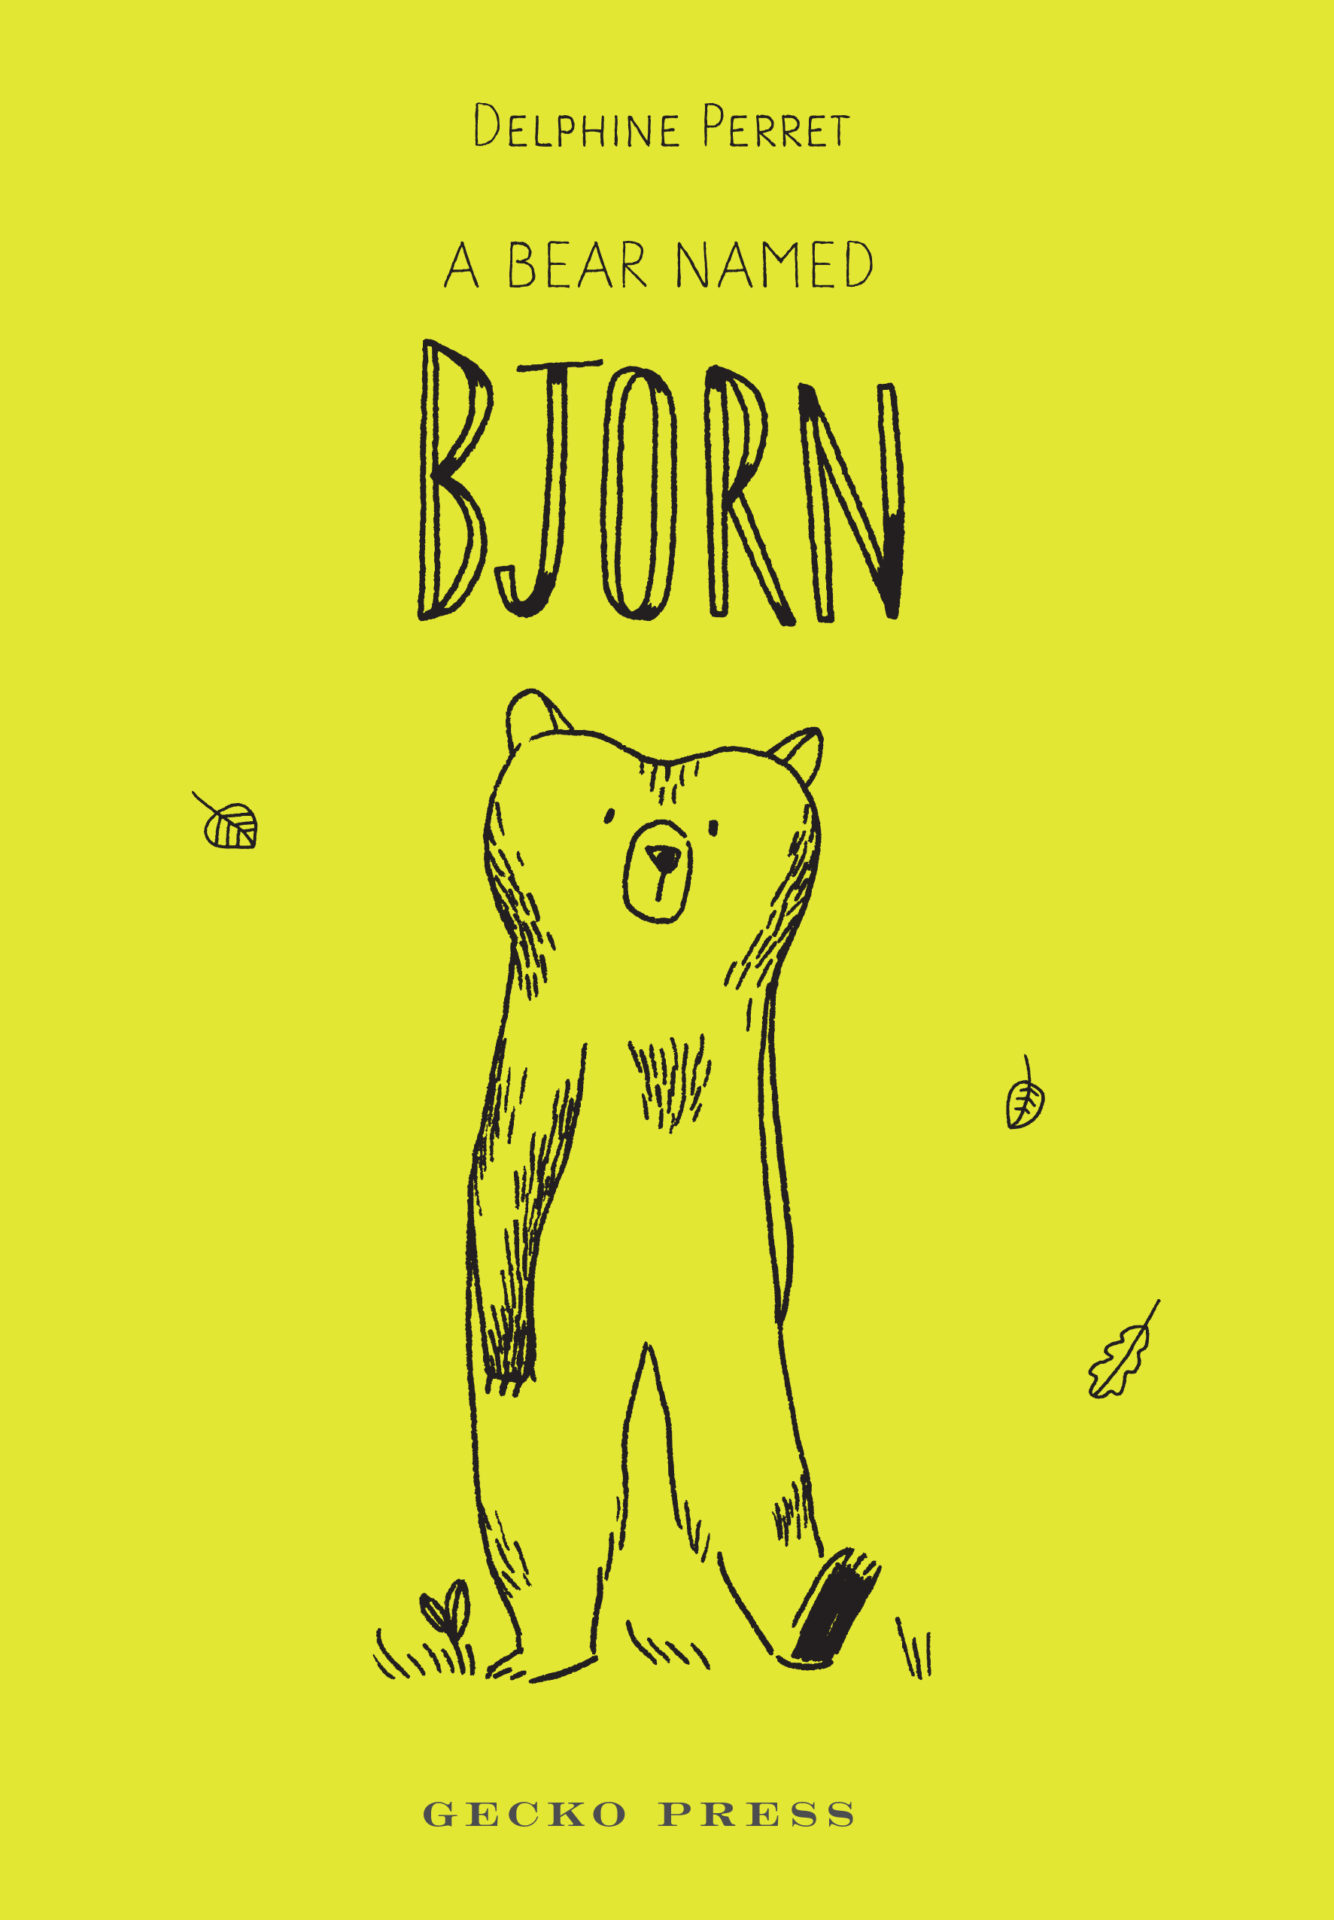 A-Bear-Named-Bjorn-cover-1